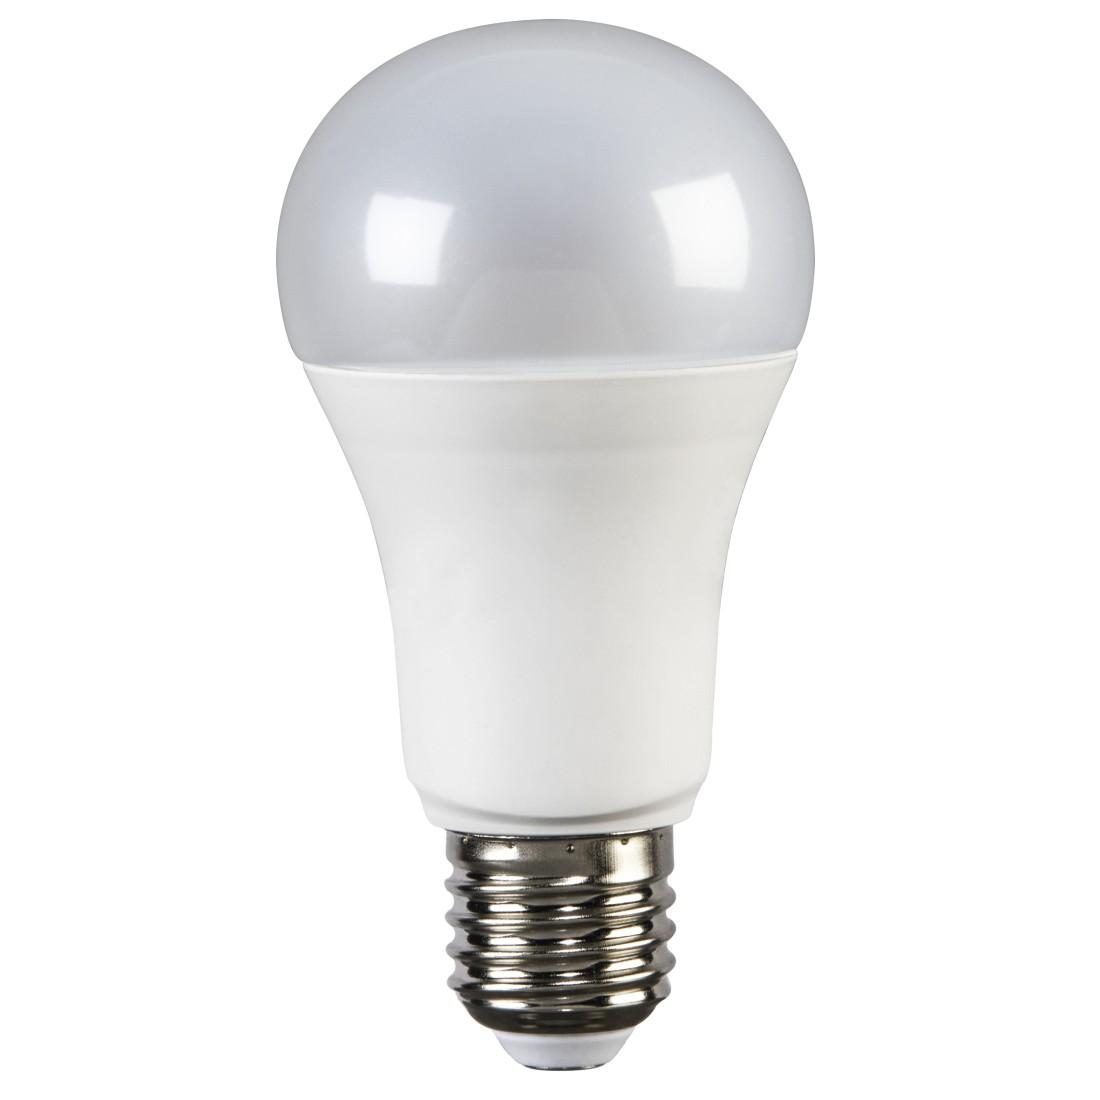 xavax.eu | 00112287 Xavax LED-Lampe, E27, 1521lm ersetzt 100W ...